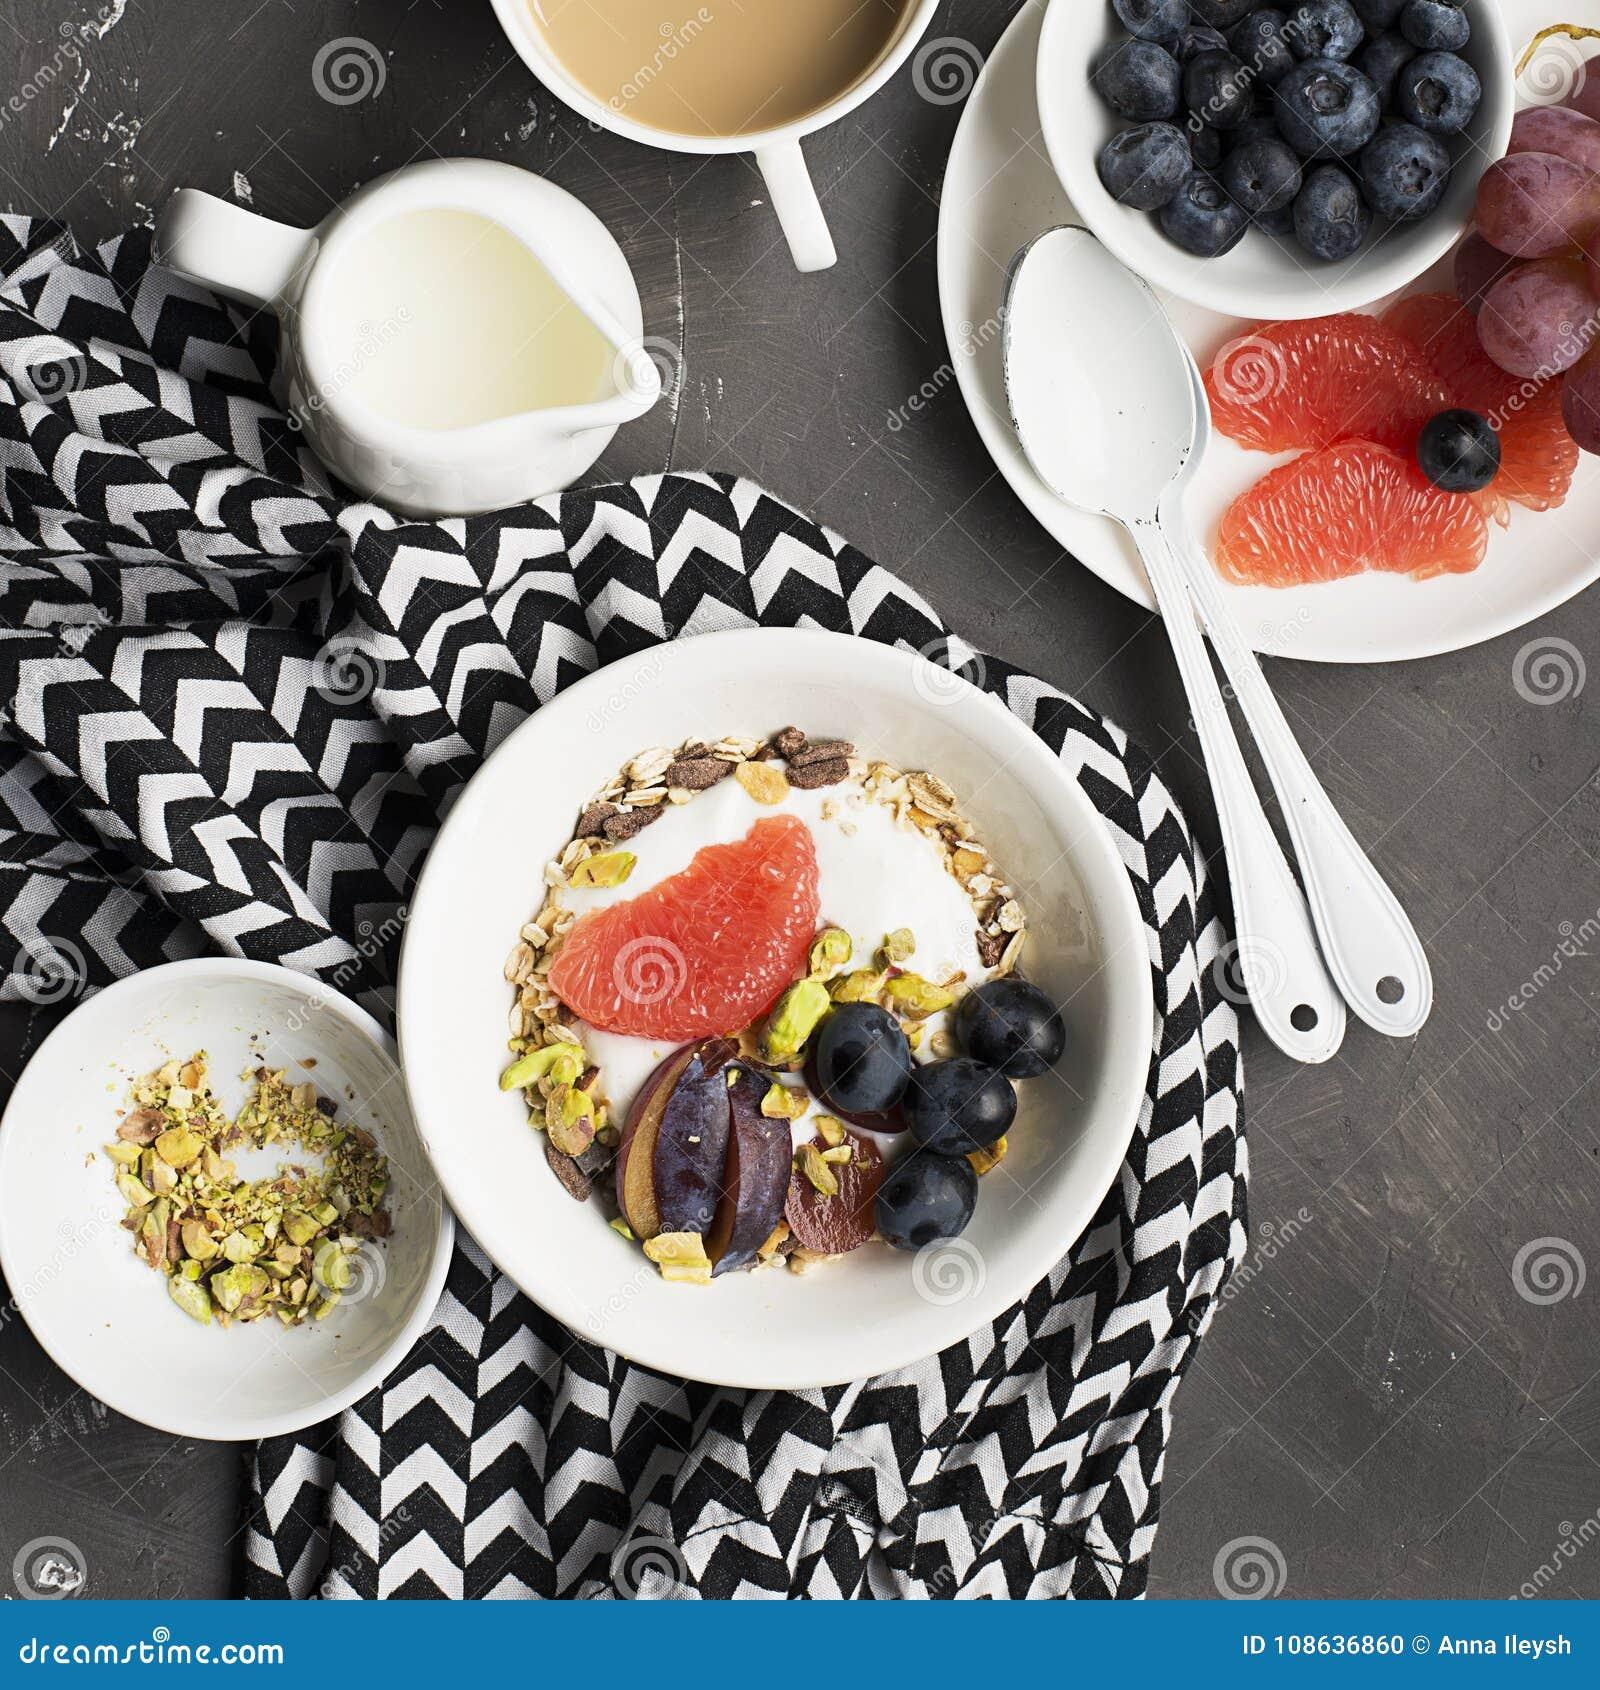 Seasonal healthy breakfast: yoghurt, chocolate granola, pink grapefruit, grapes, pistachios. Top view. Copy space. flat